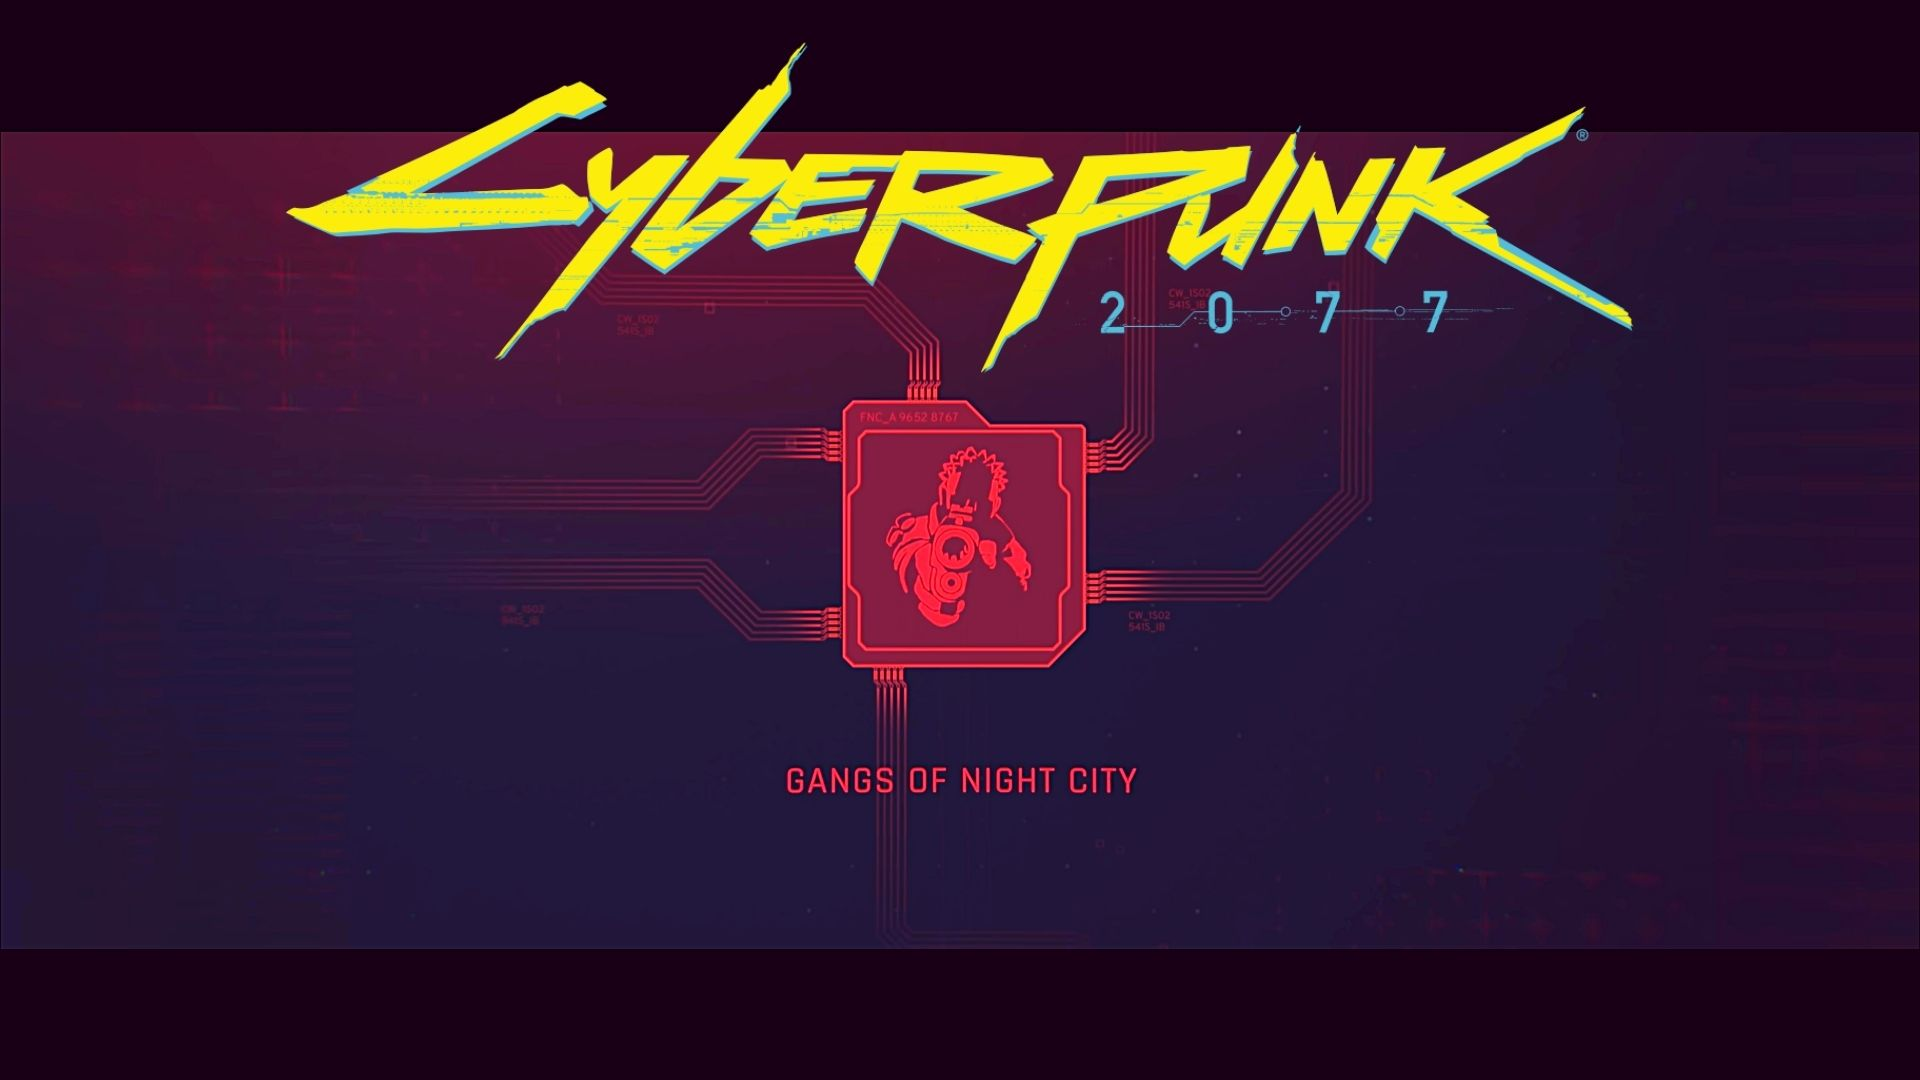 The gangs of Cyberpunk 2077